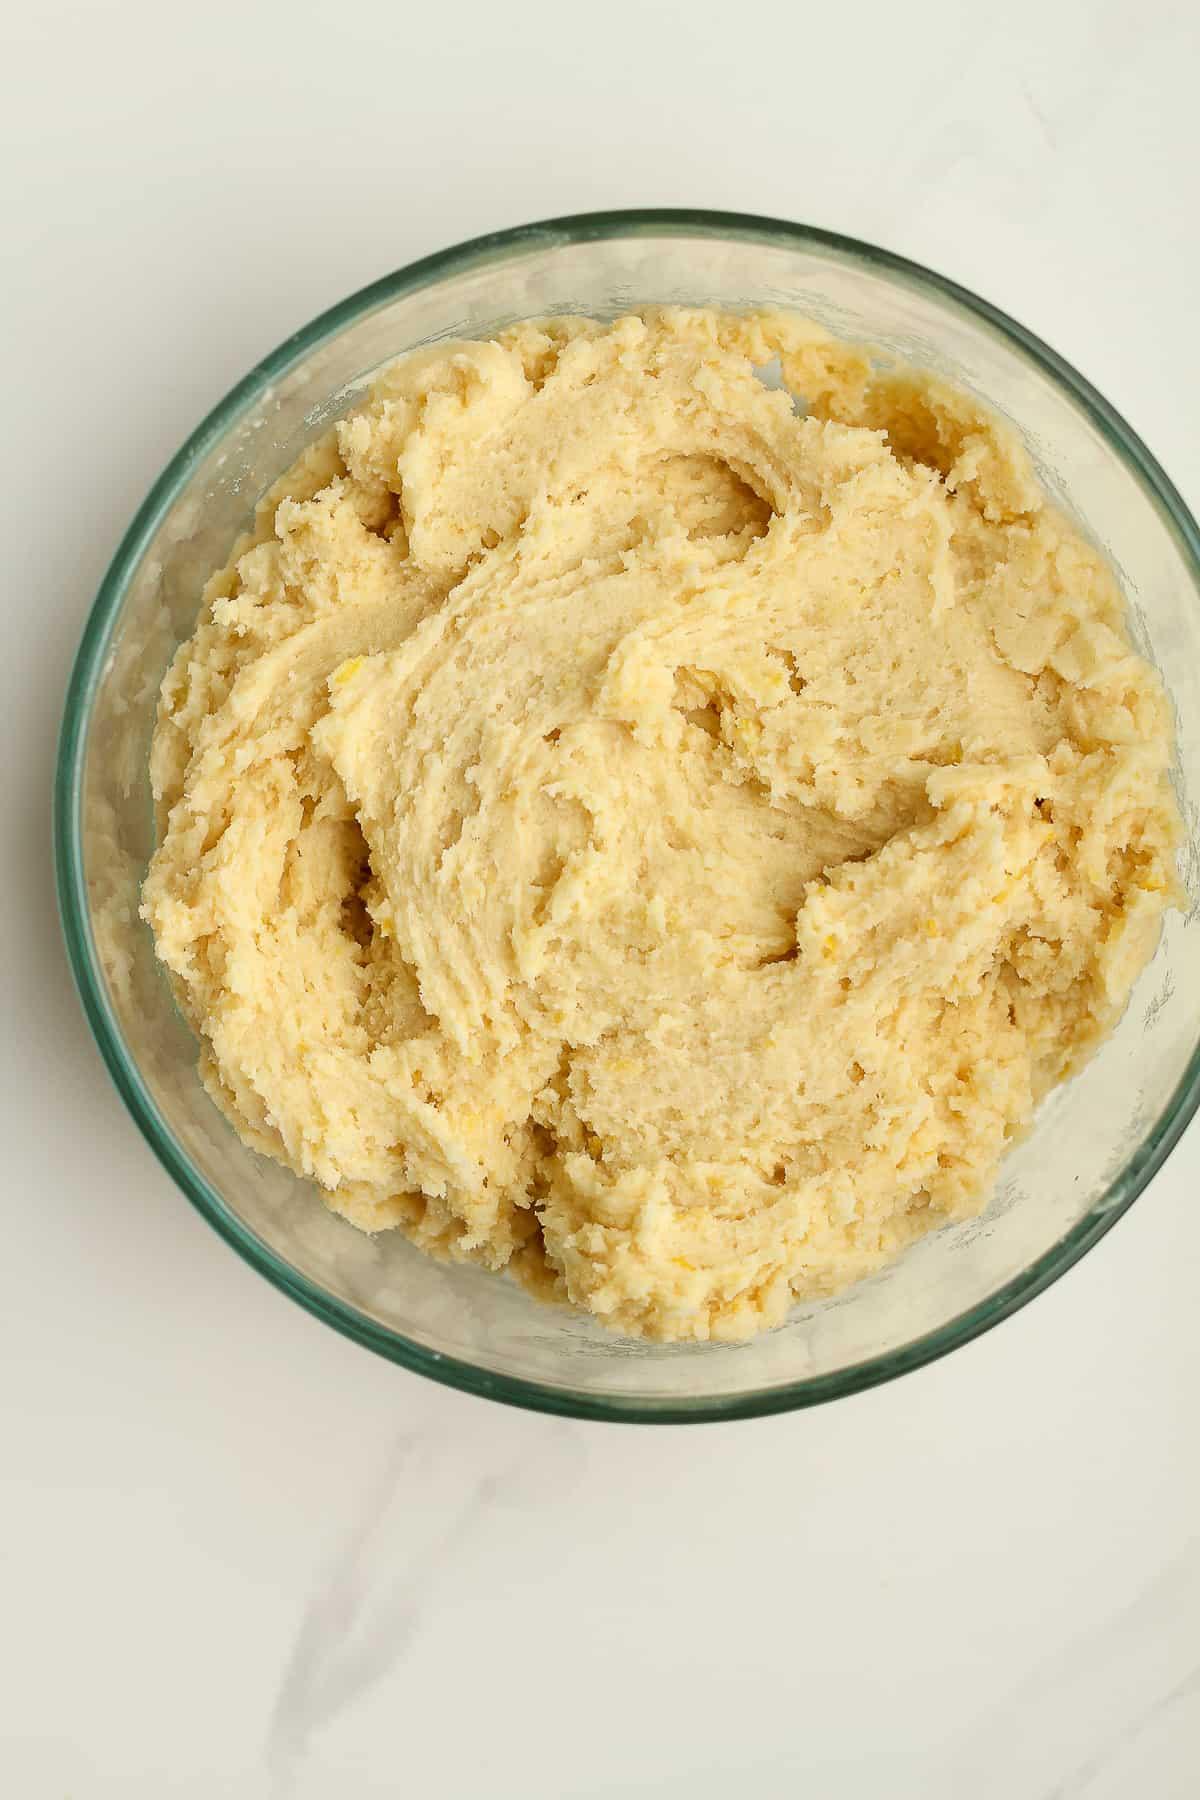 A bowl of lemon sugar cookie dough.